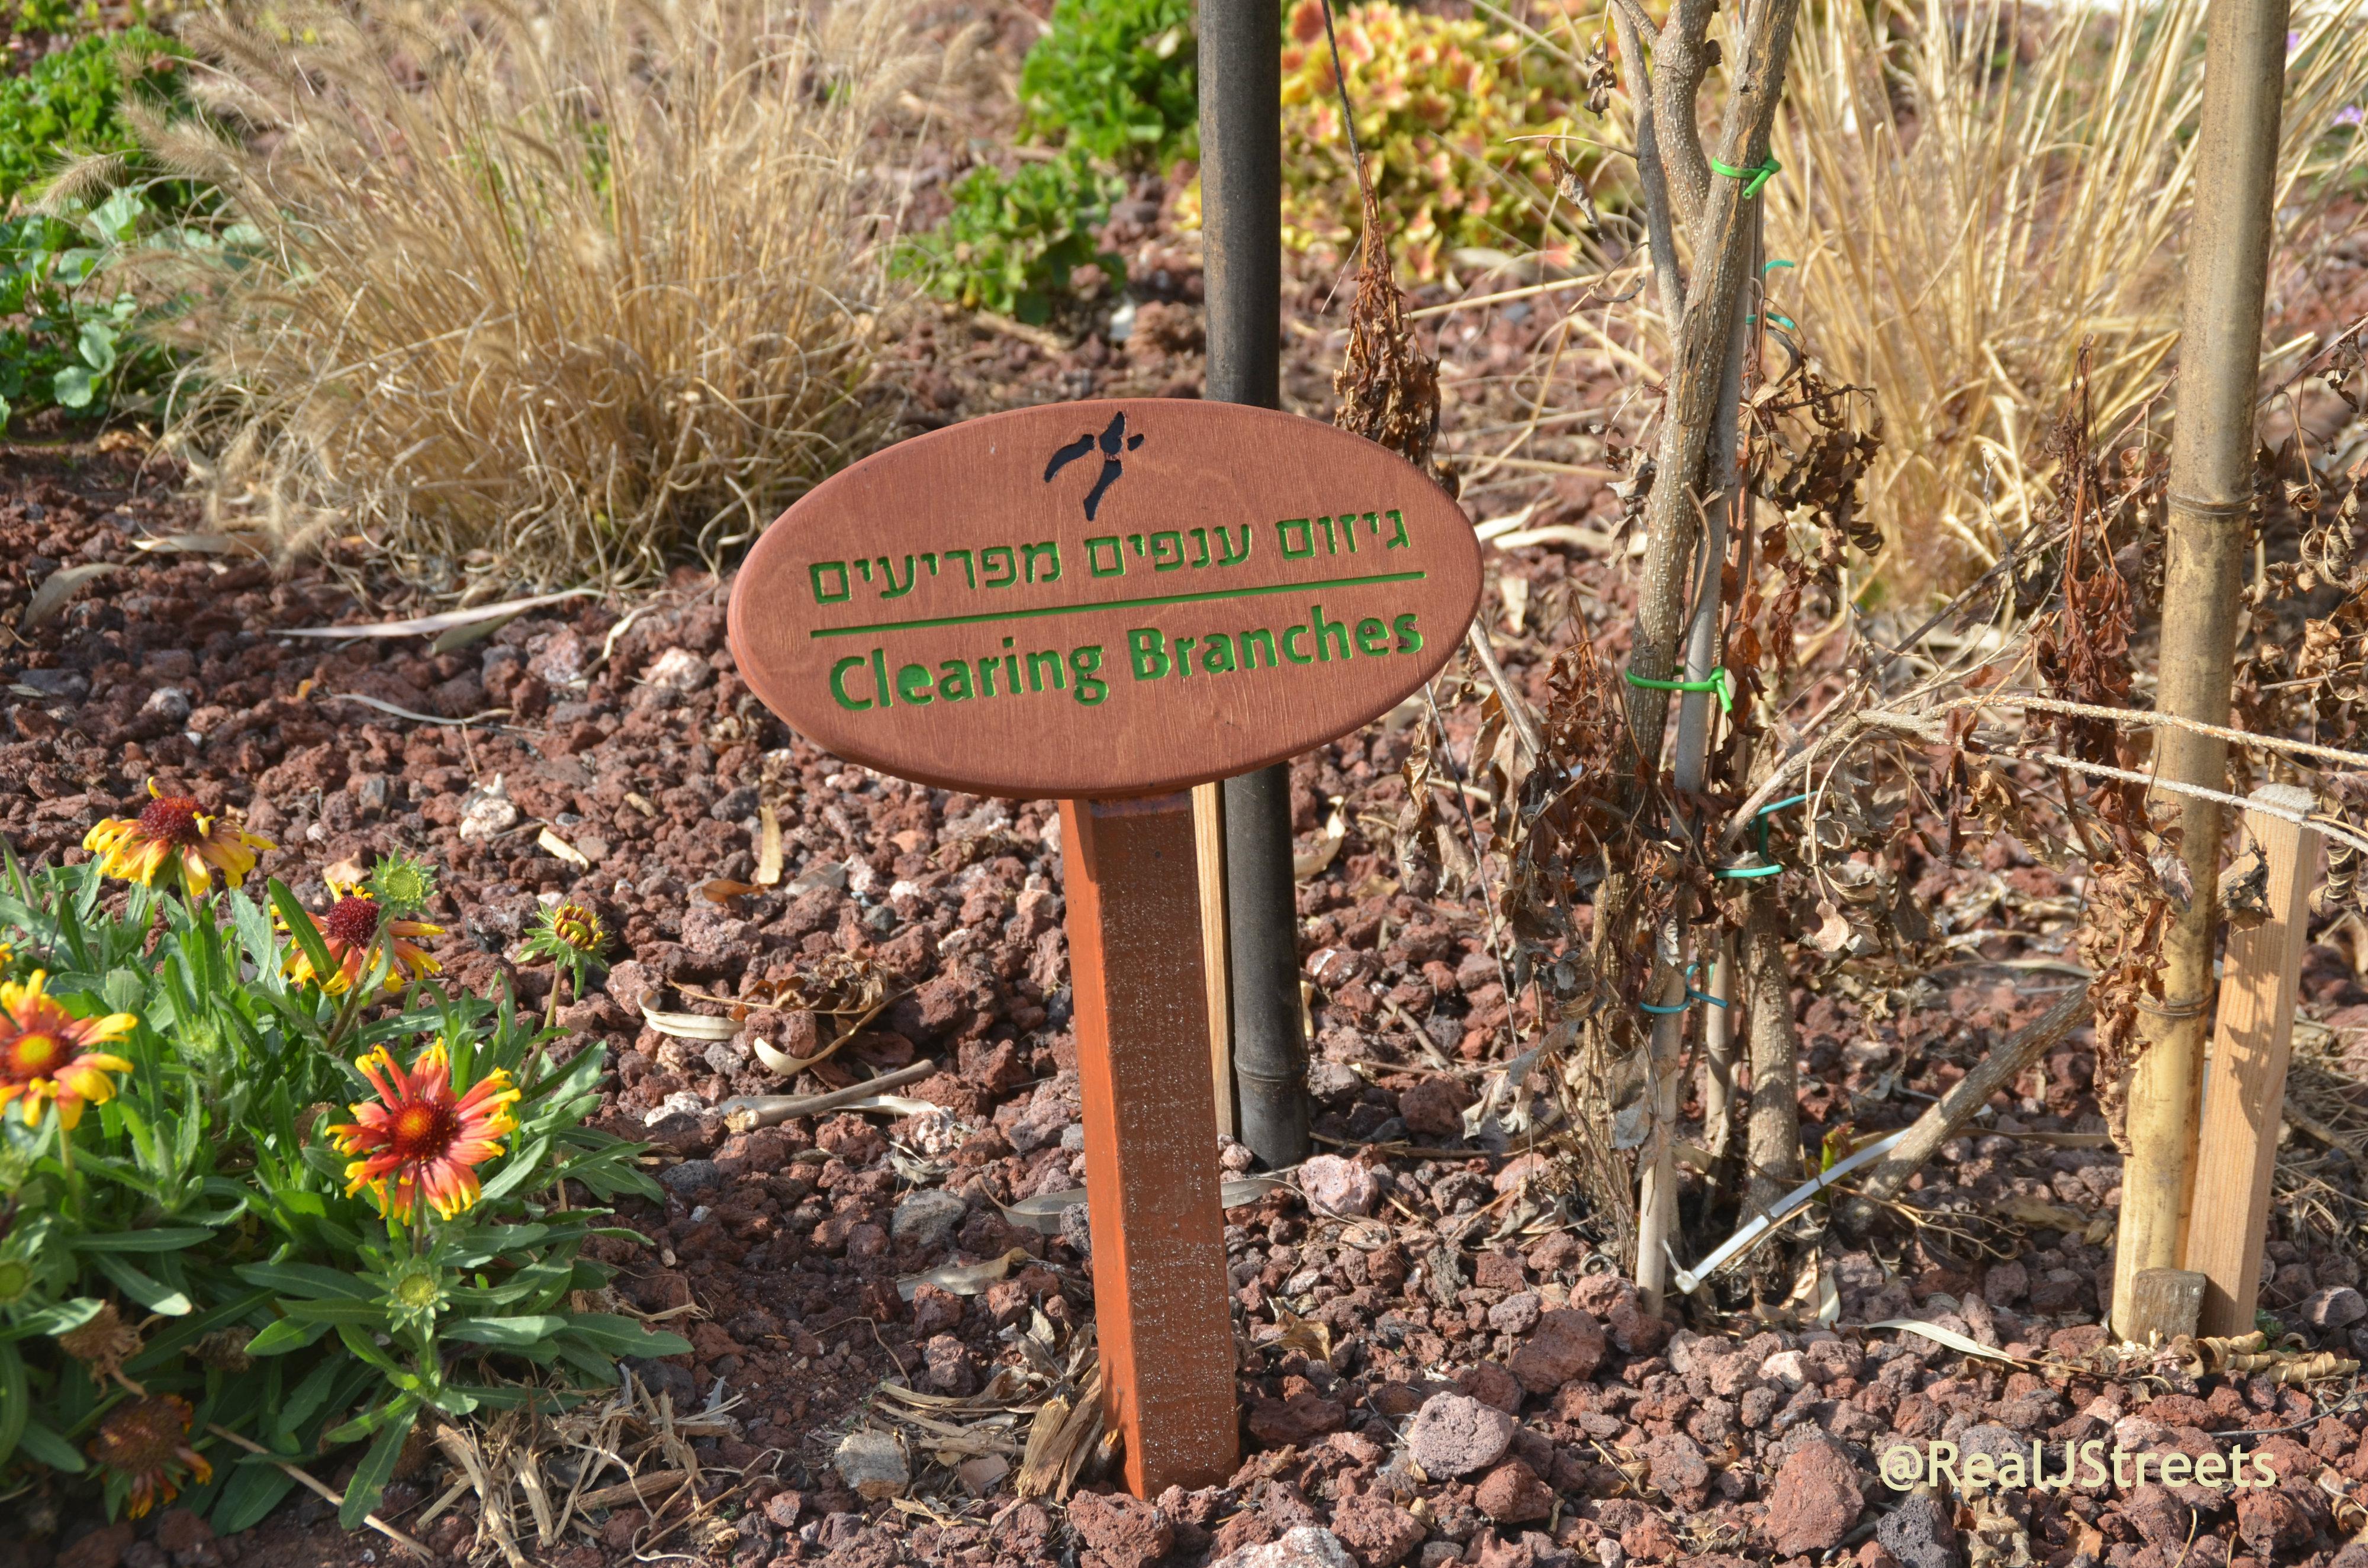 image shimita park